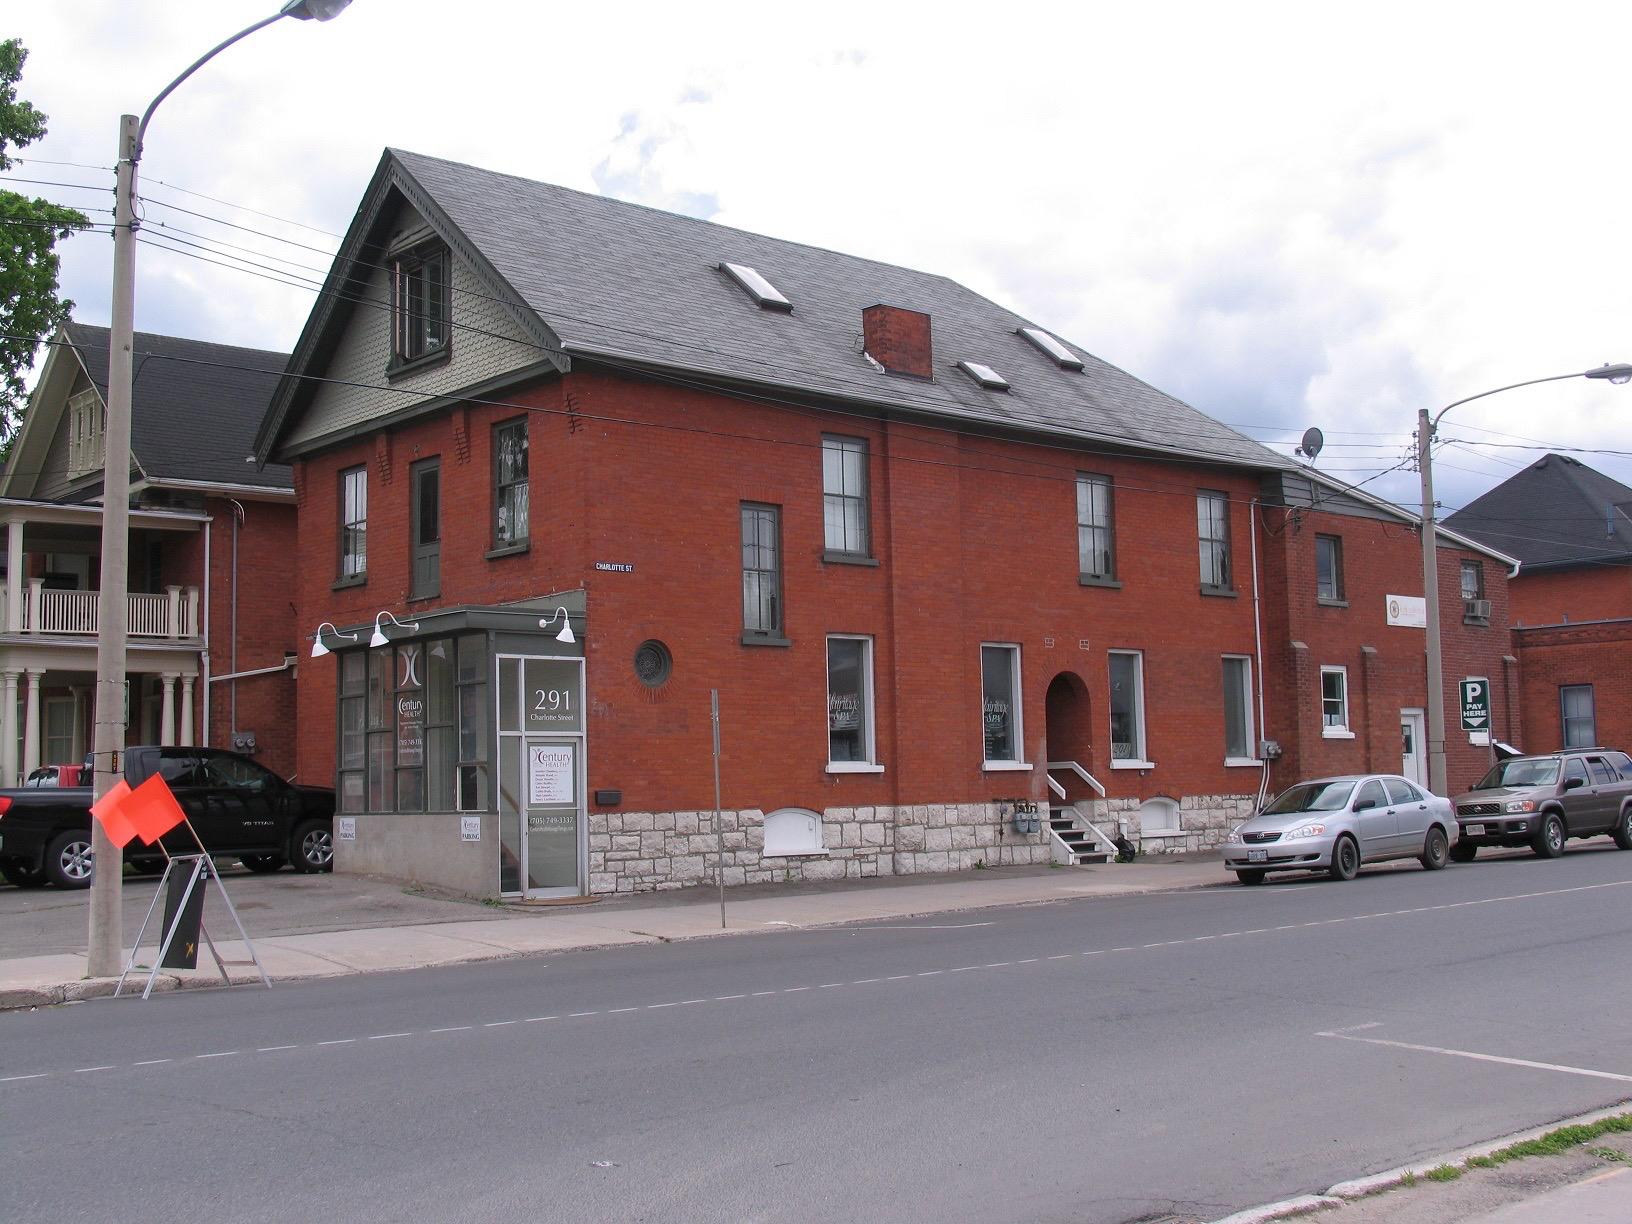 Design & Build Project: The Clark Building - Exterior